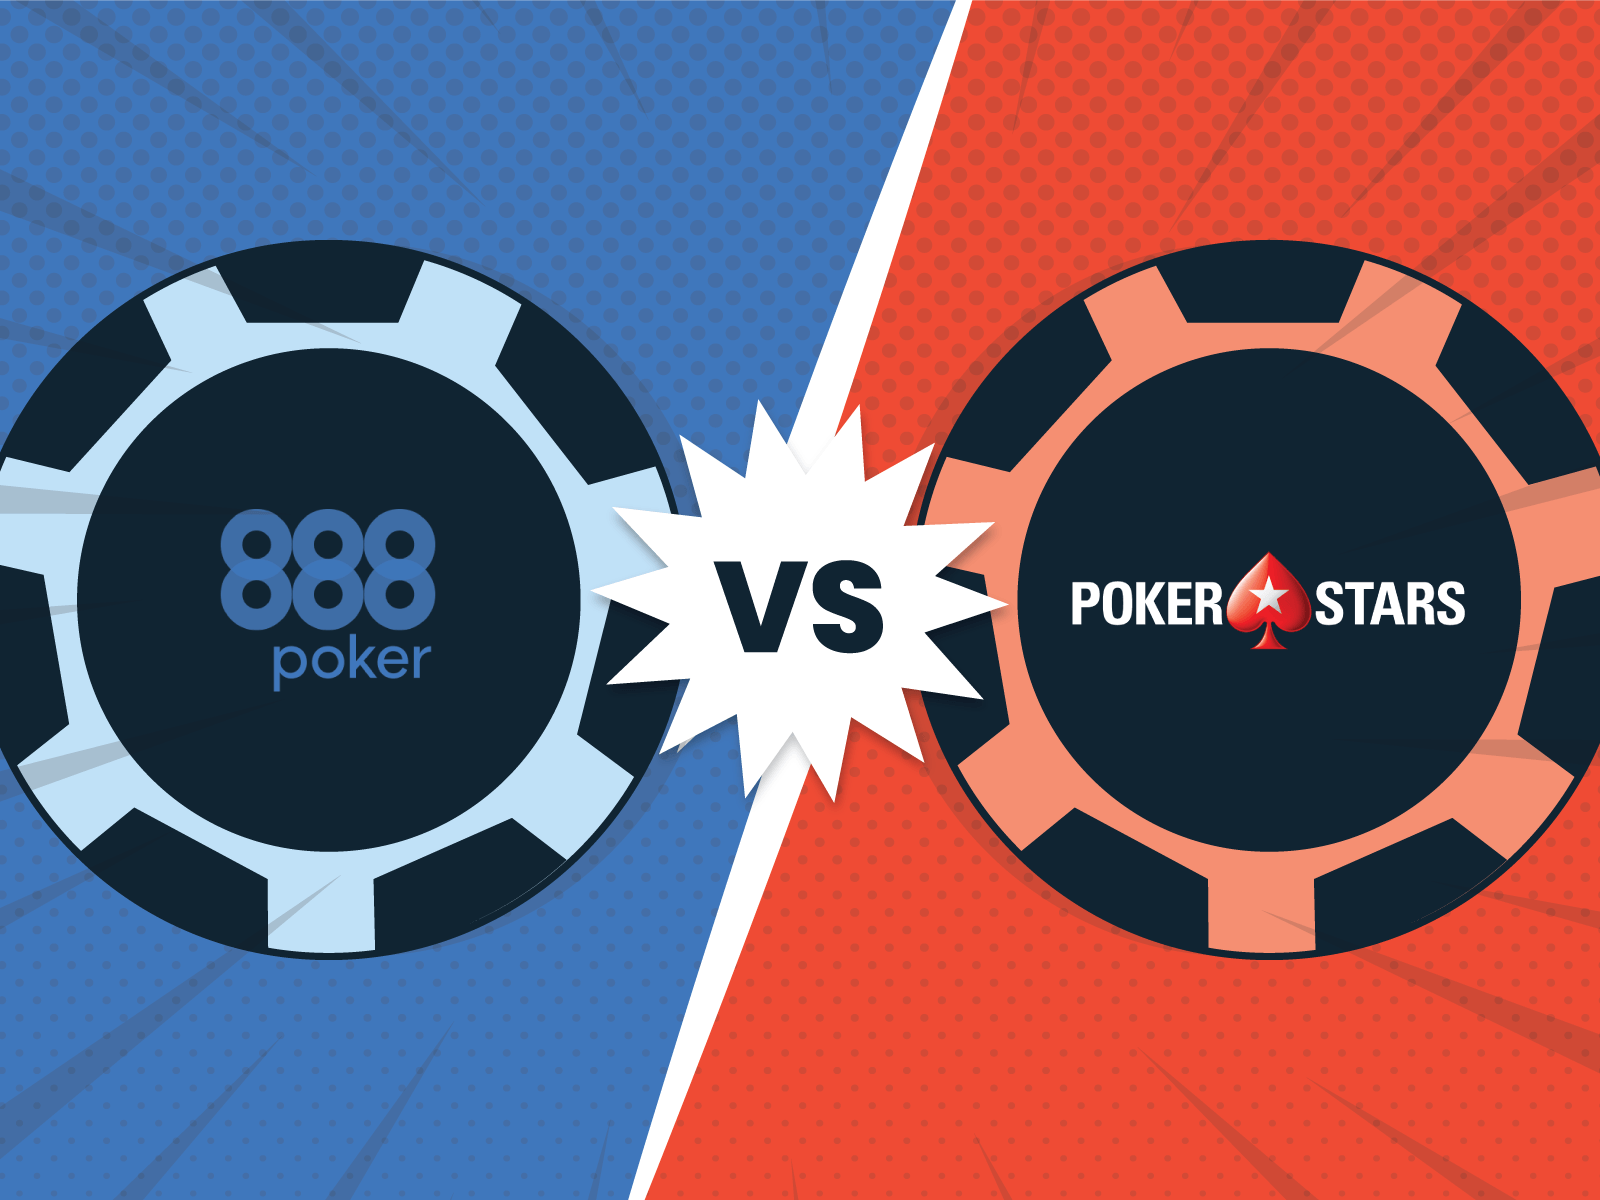 Pokerstars Vs 888poker Which Is Better For You